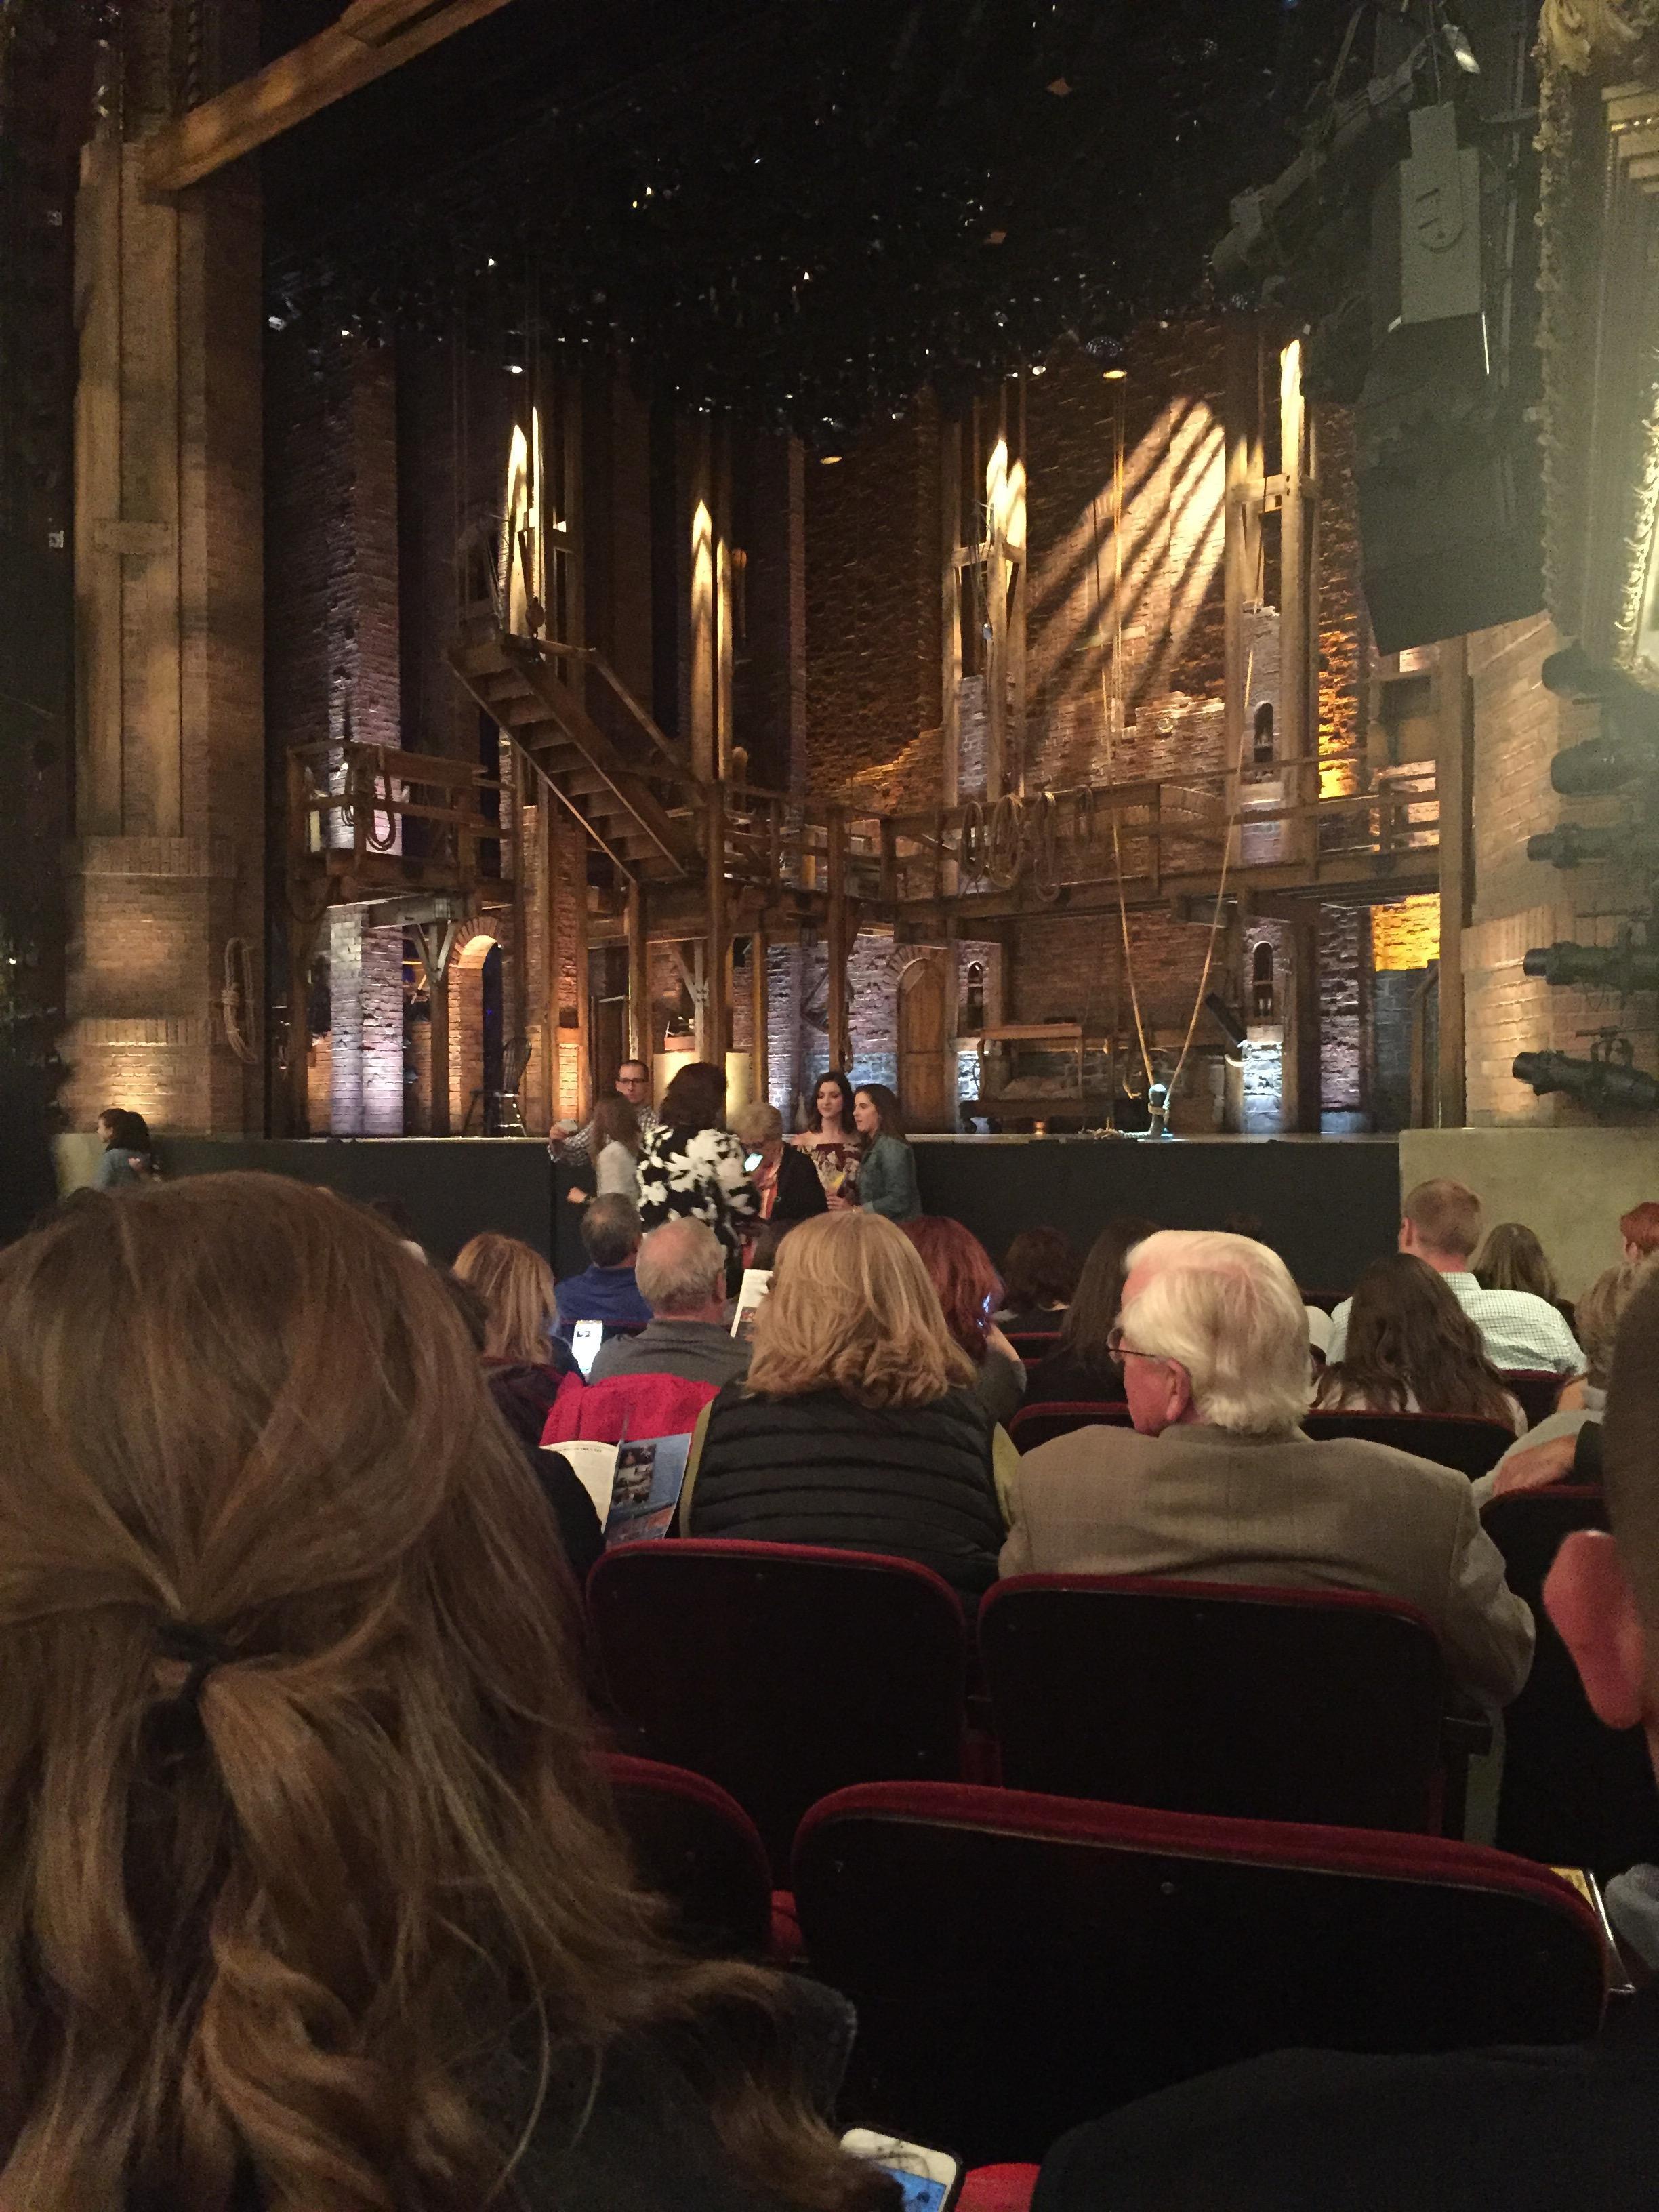 CIBC Theatre Section Orchestra r Row L Seat 20